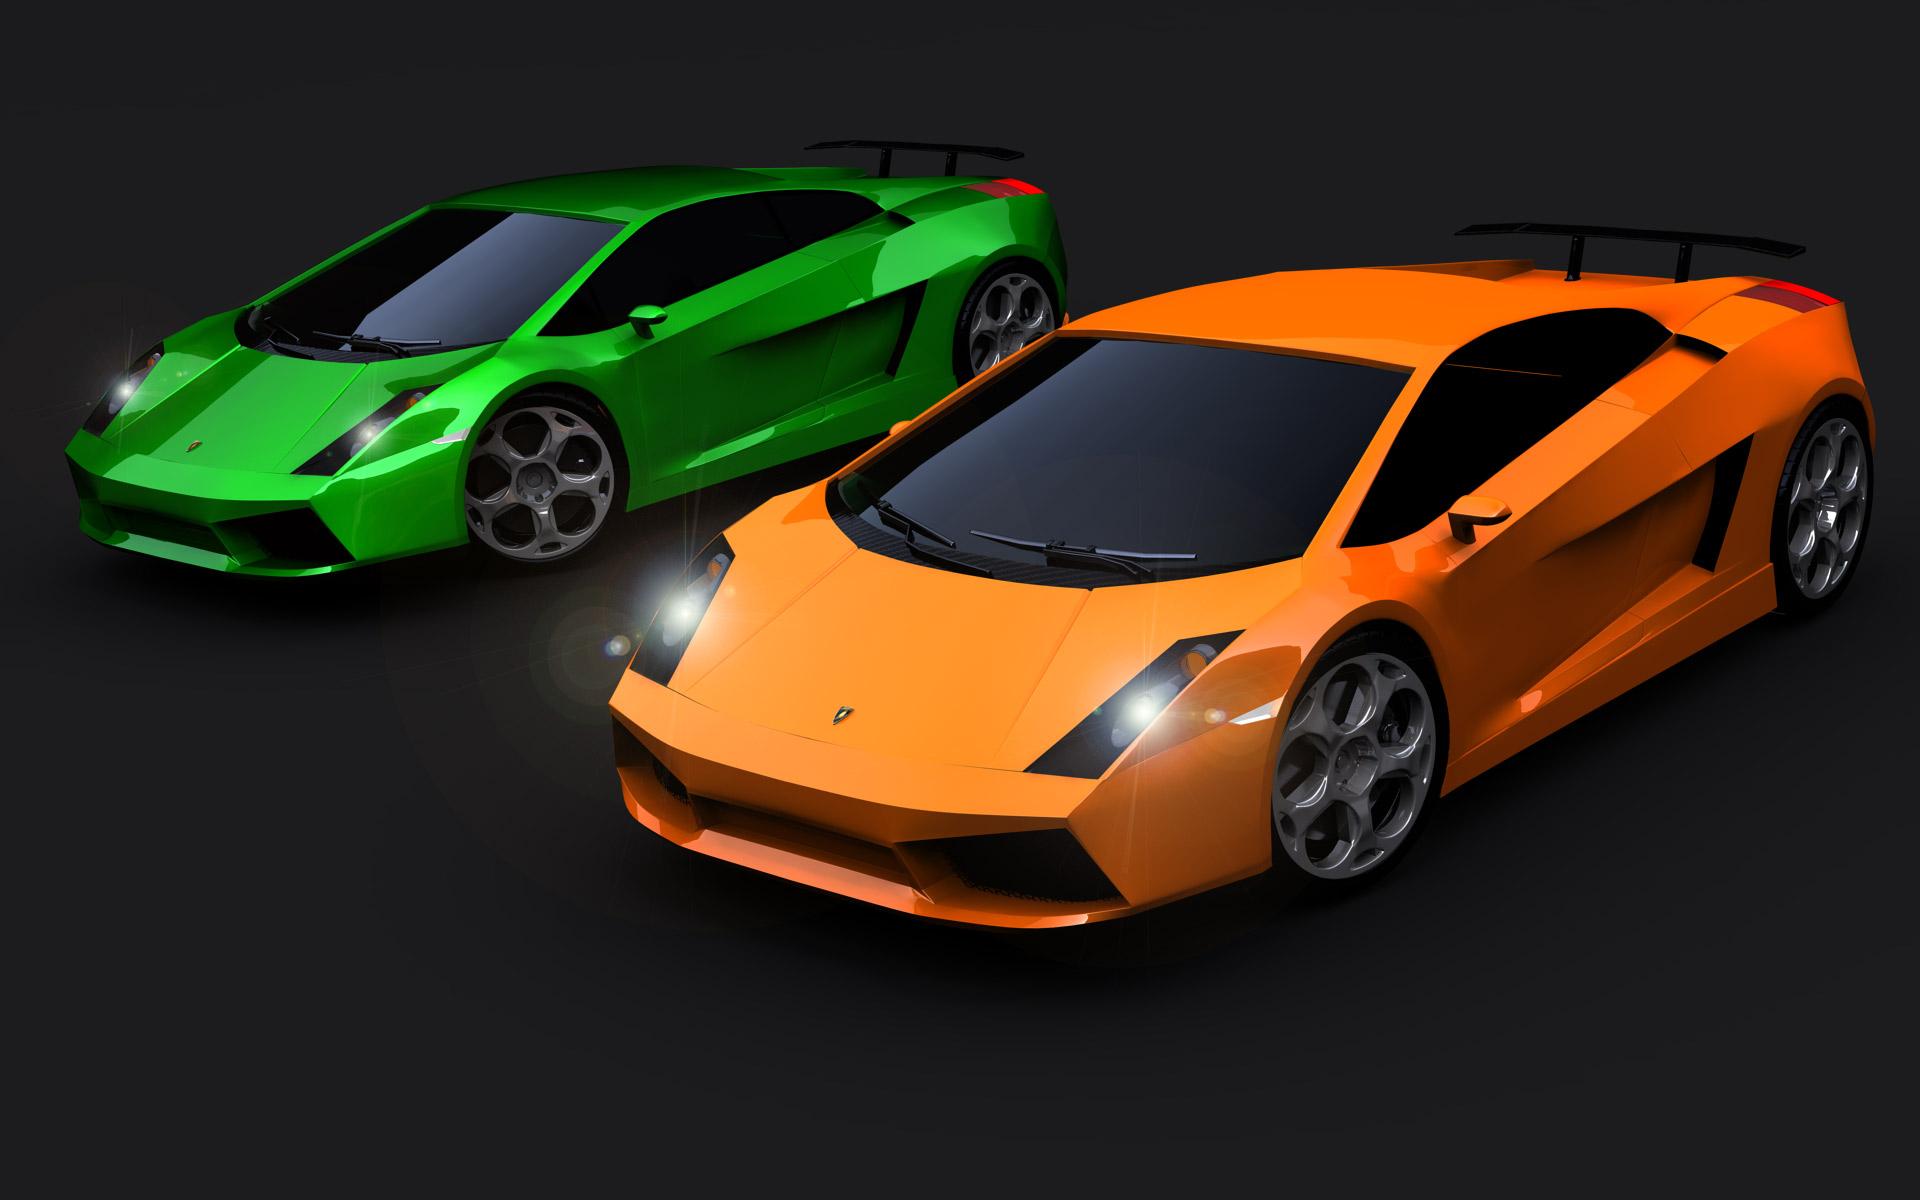 Lamborghini Gallardo Wallpaper 4539 Hd Wallpapers in Cars   Imagesci 1920x1200